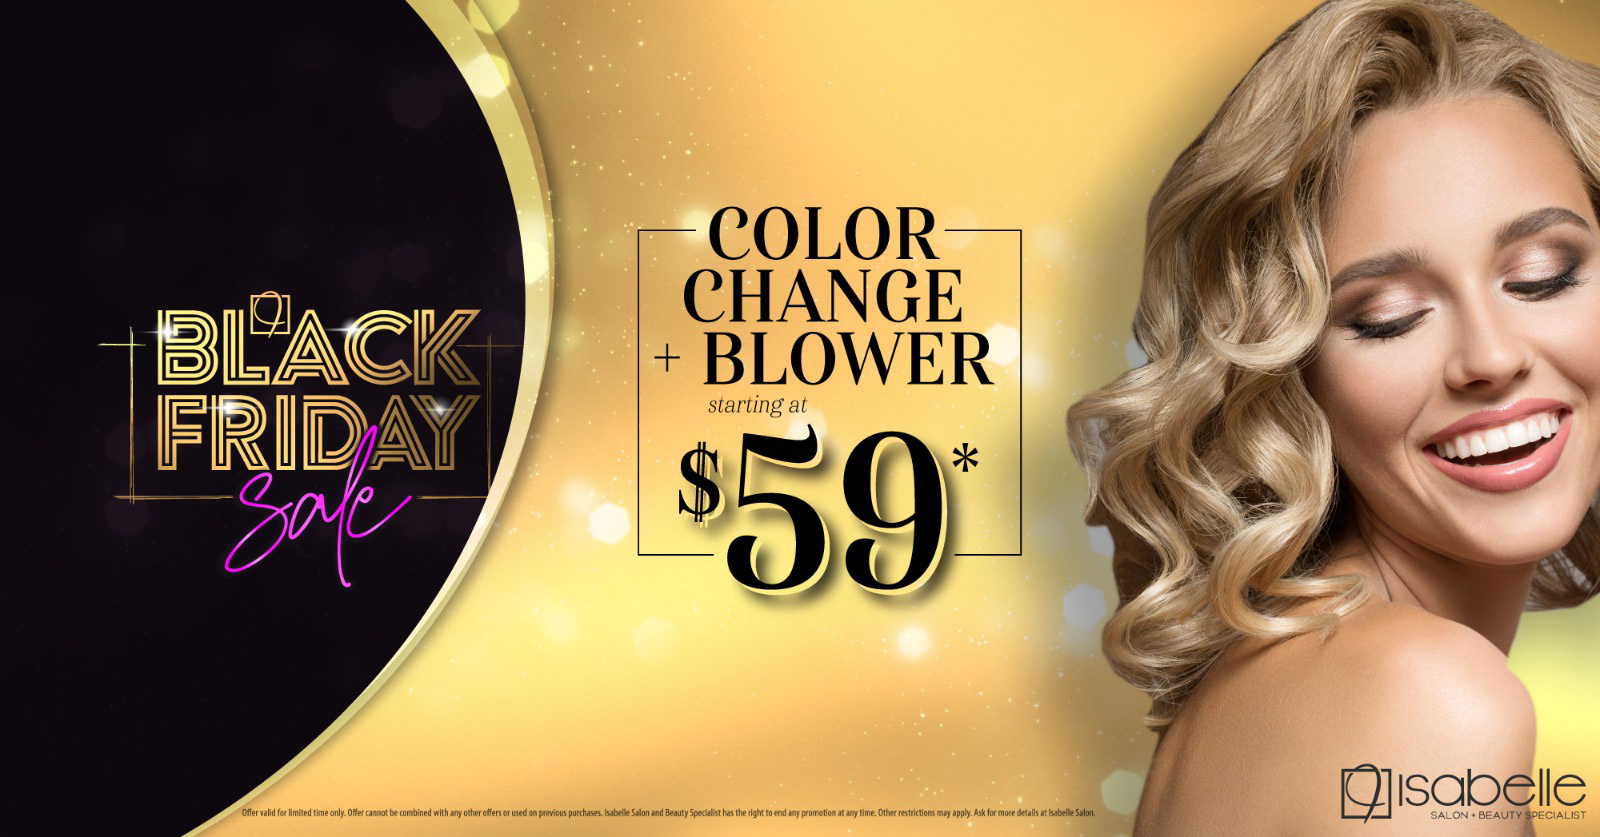 Beauty Salon Black Friday Campaign On Behance